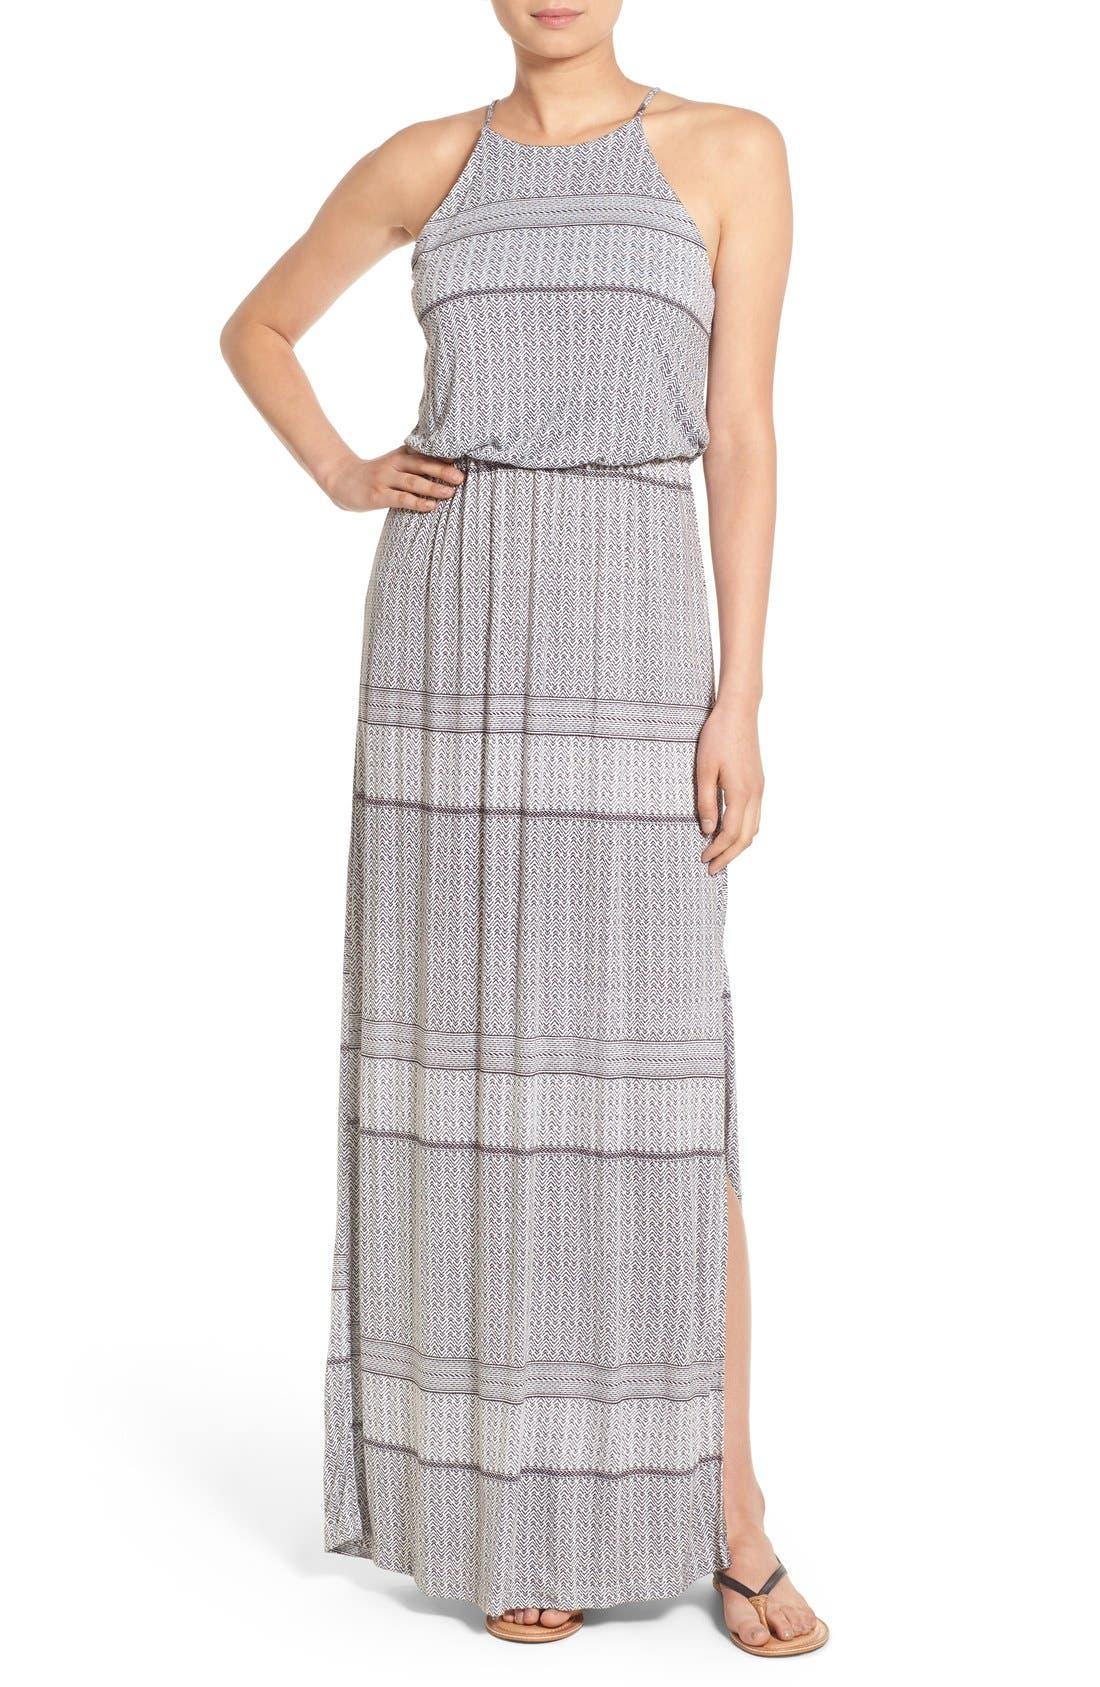 Alternate Image 1 Selected - Lush High Neck Maxi Dress